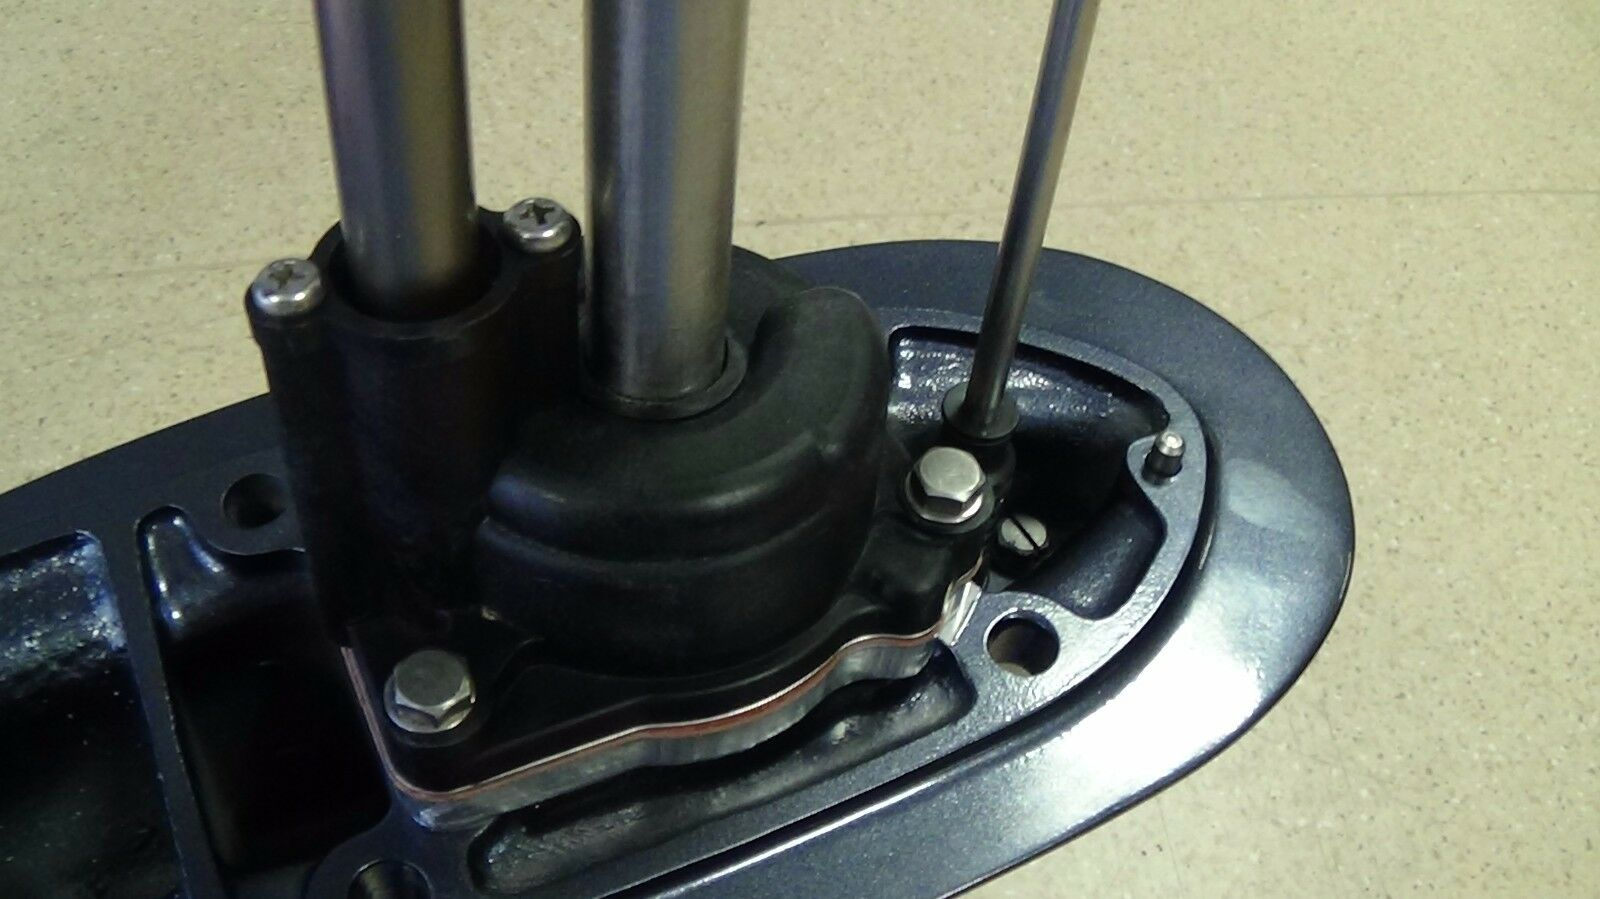 YANMAR Diesel D36 D40 D40 D40  UL LL L Lower Unit Assy 2 - 796640-02550 1eea56